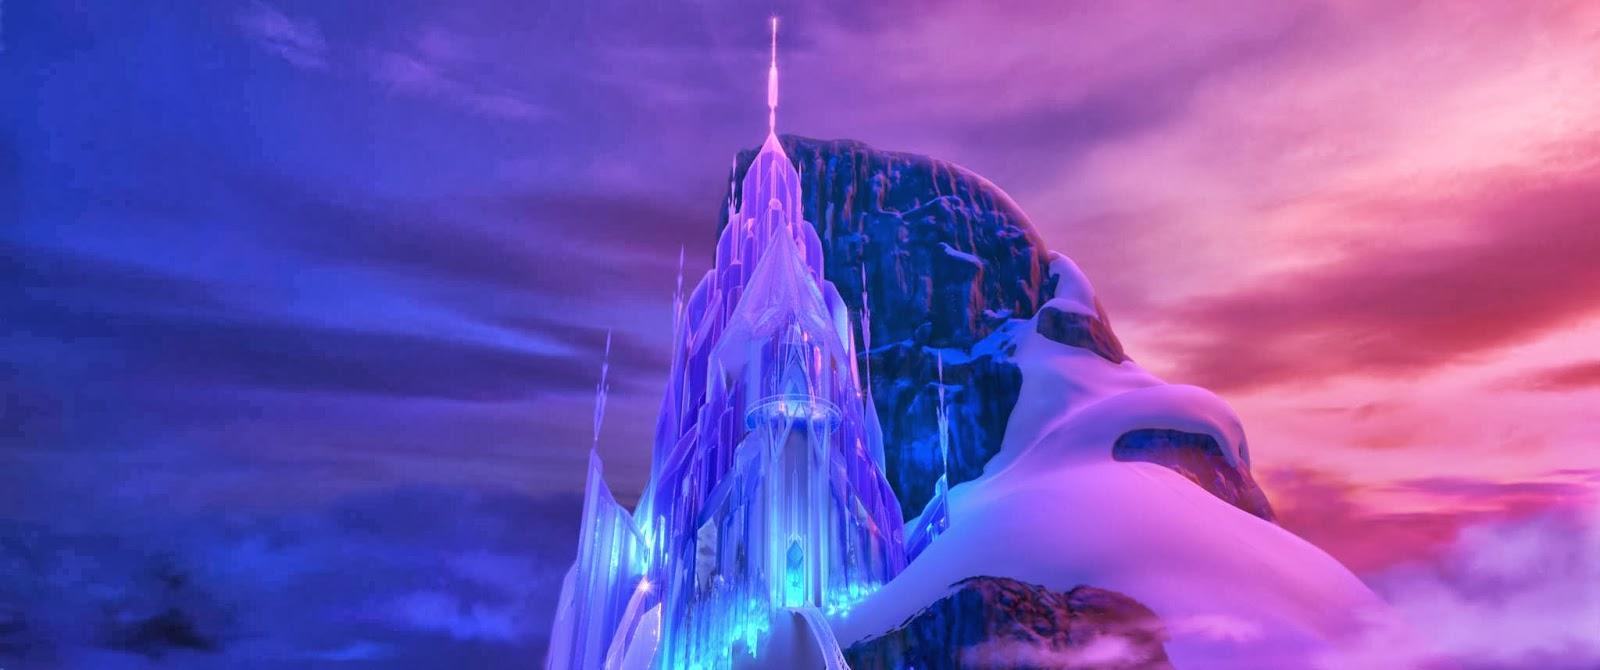 Frozen Disney animatedfilmreviews.blogspot.com